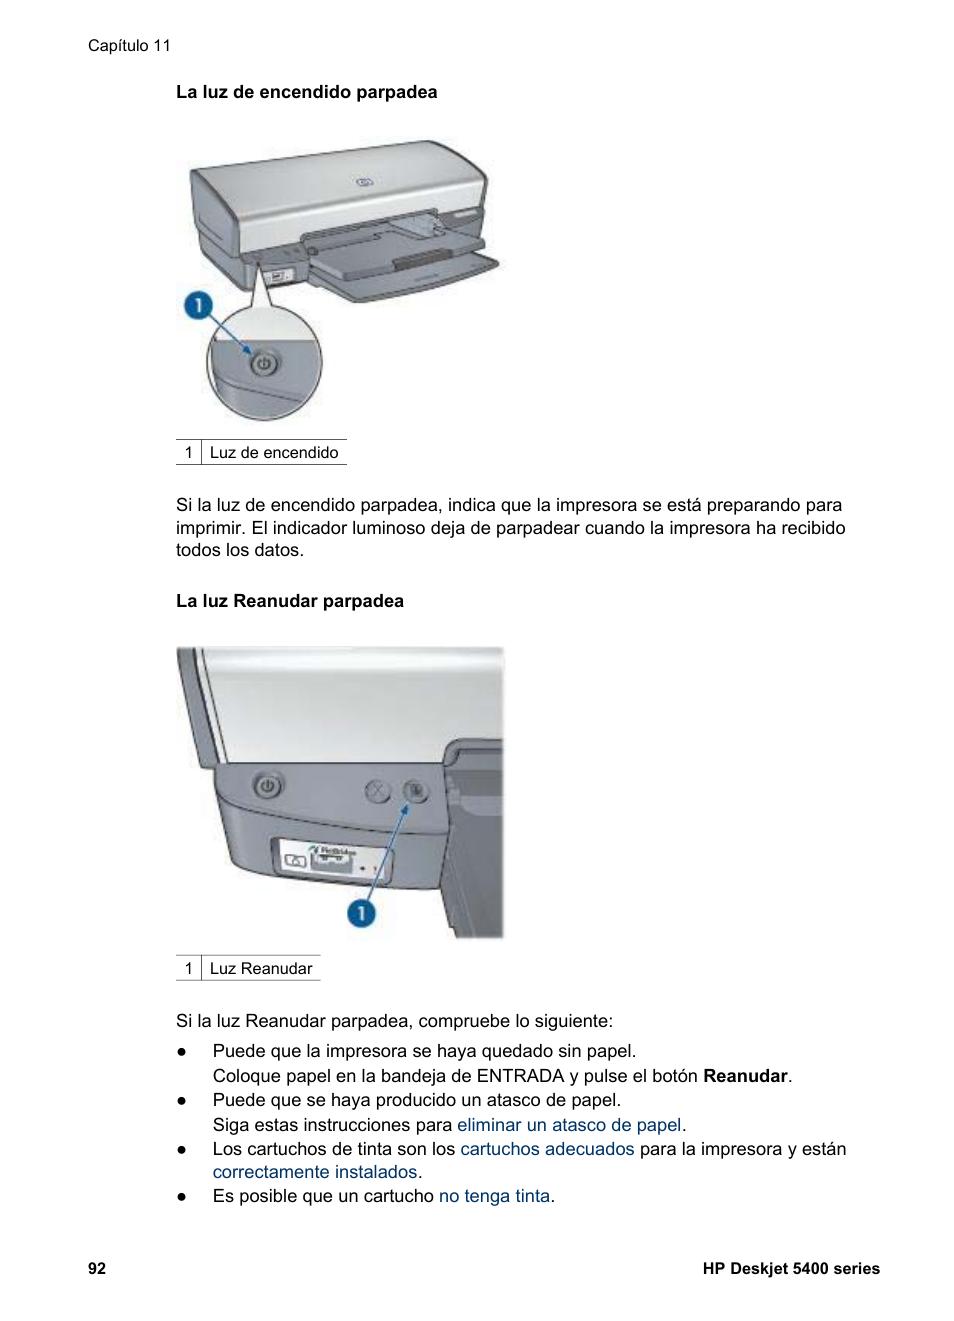 bonito reanudar impresora modelo ejemplo de colecci n de rh collectifcreatif info hp deskjet 6540 manual HP Deskjet 1280